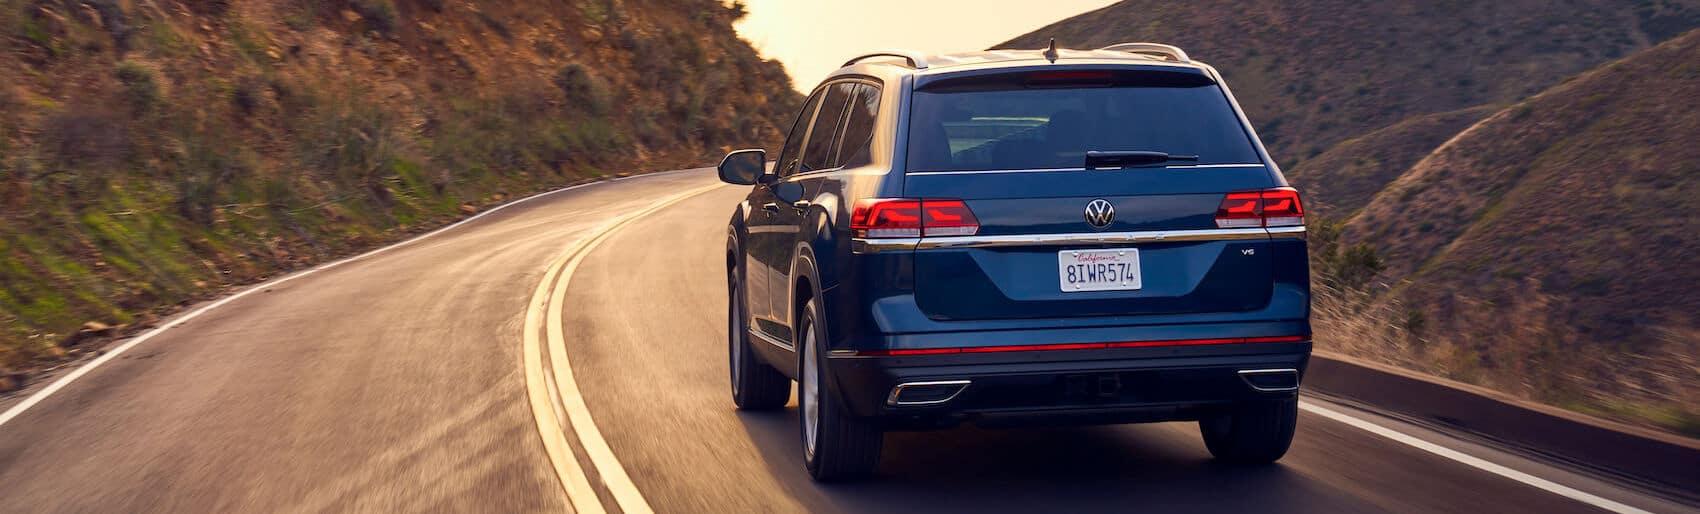 Volkswagen Atlas Safety Rating